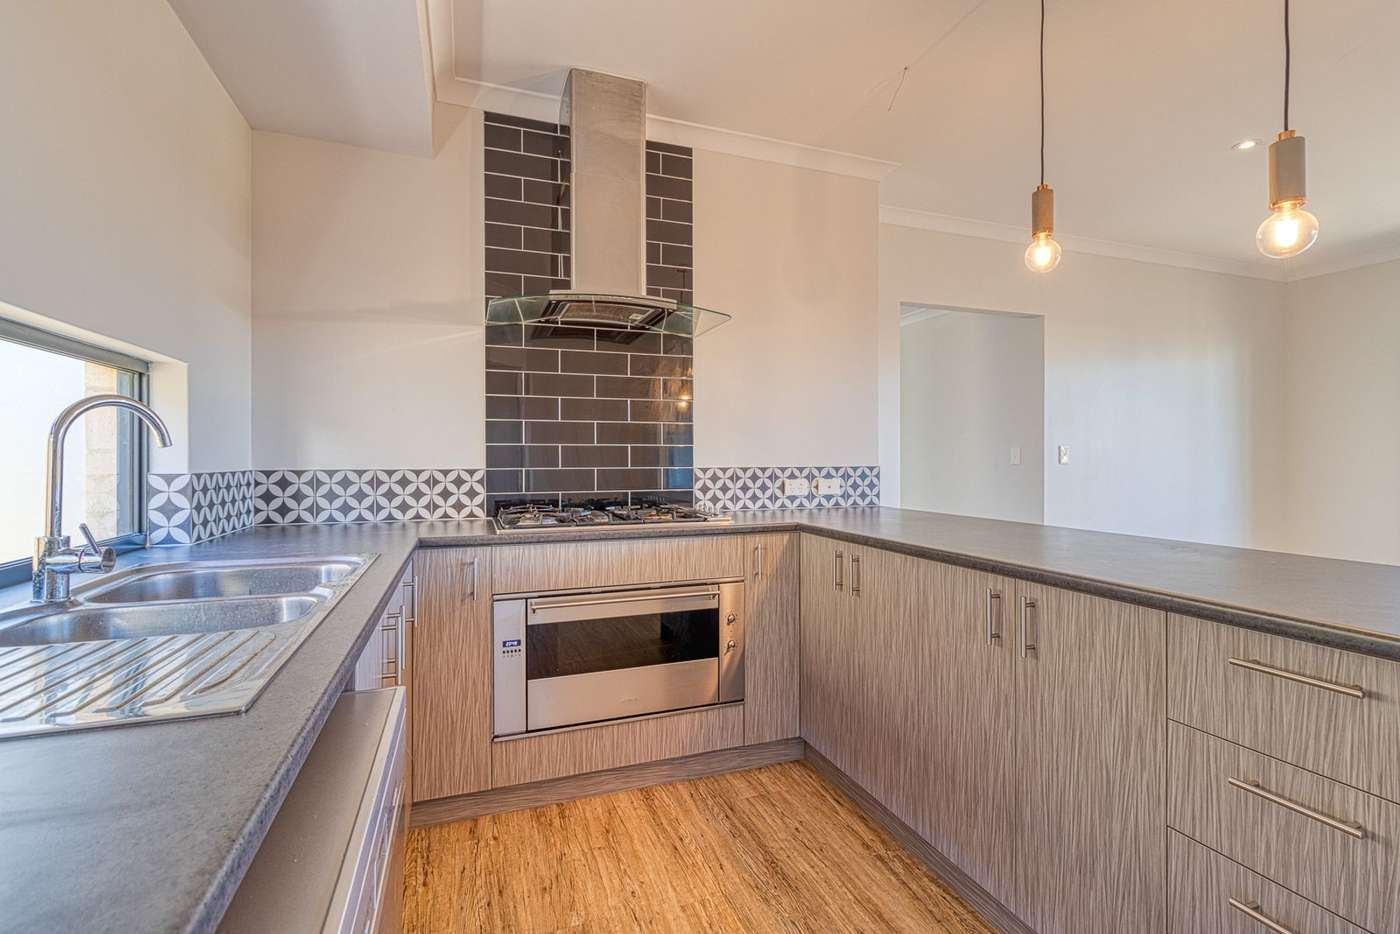 Sixth view of Homely house listing, 2 Medinah Street, Dunsborough WA 6281